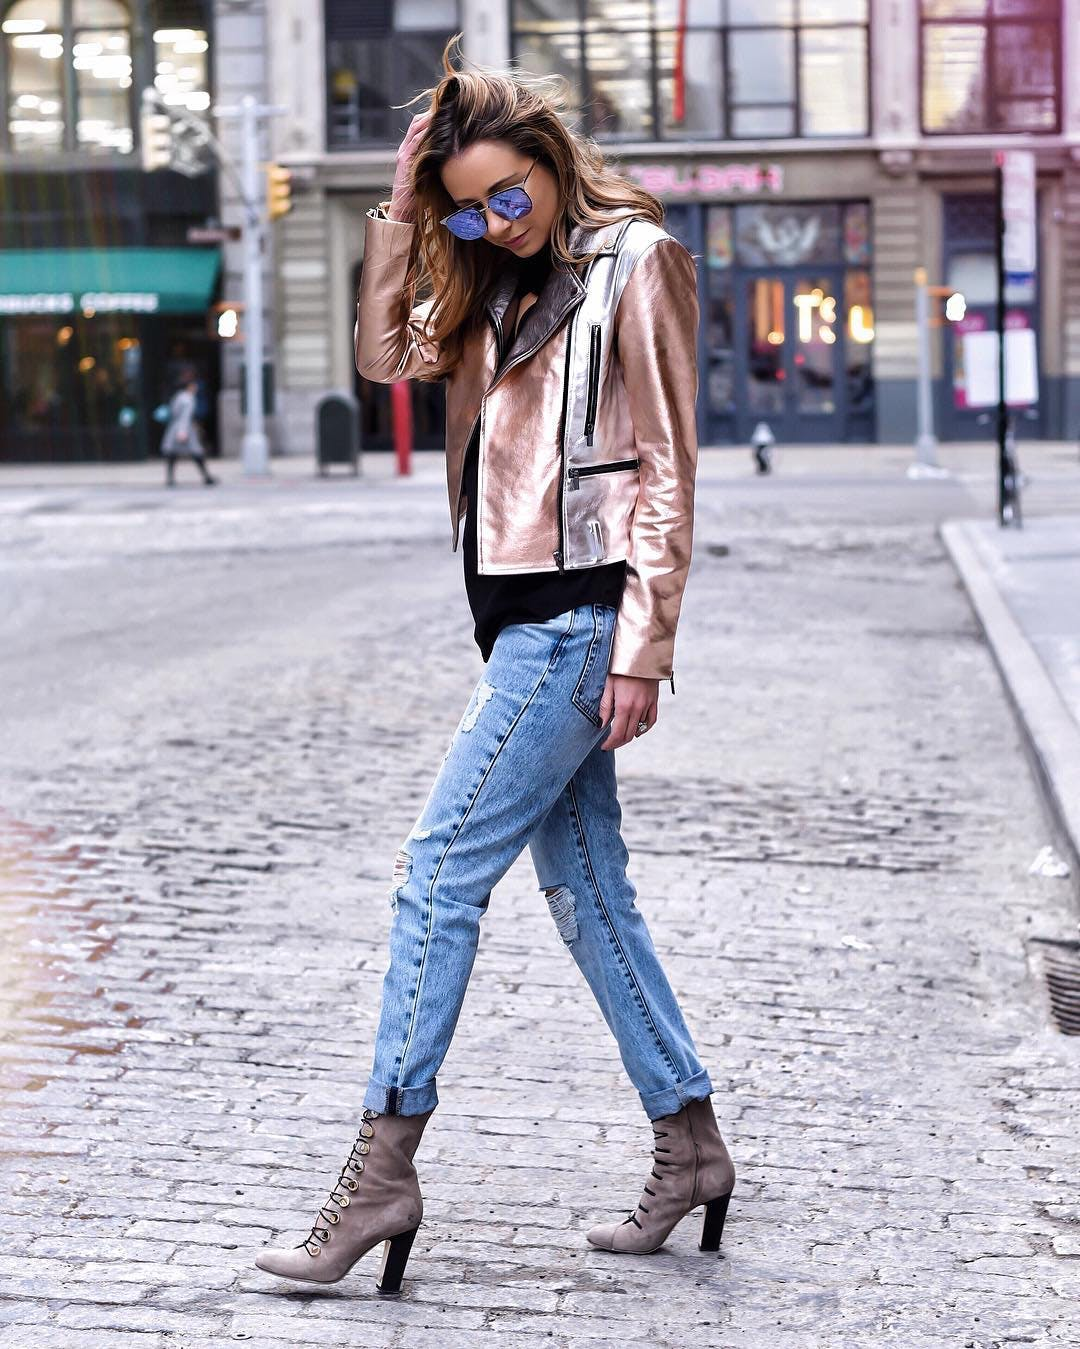 marni harvey wearing a metallic moto jacket